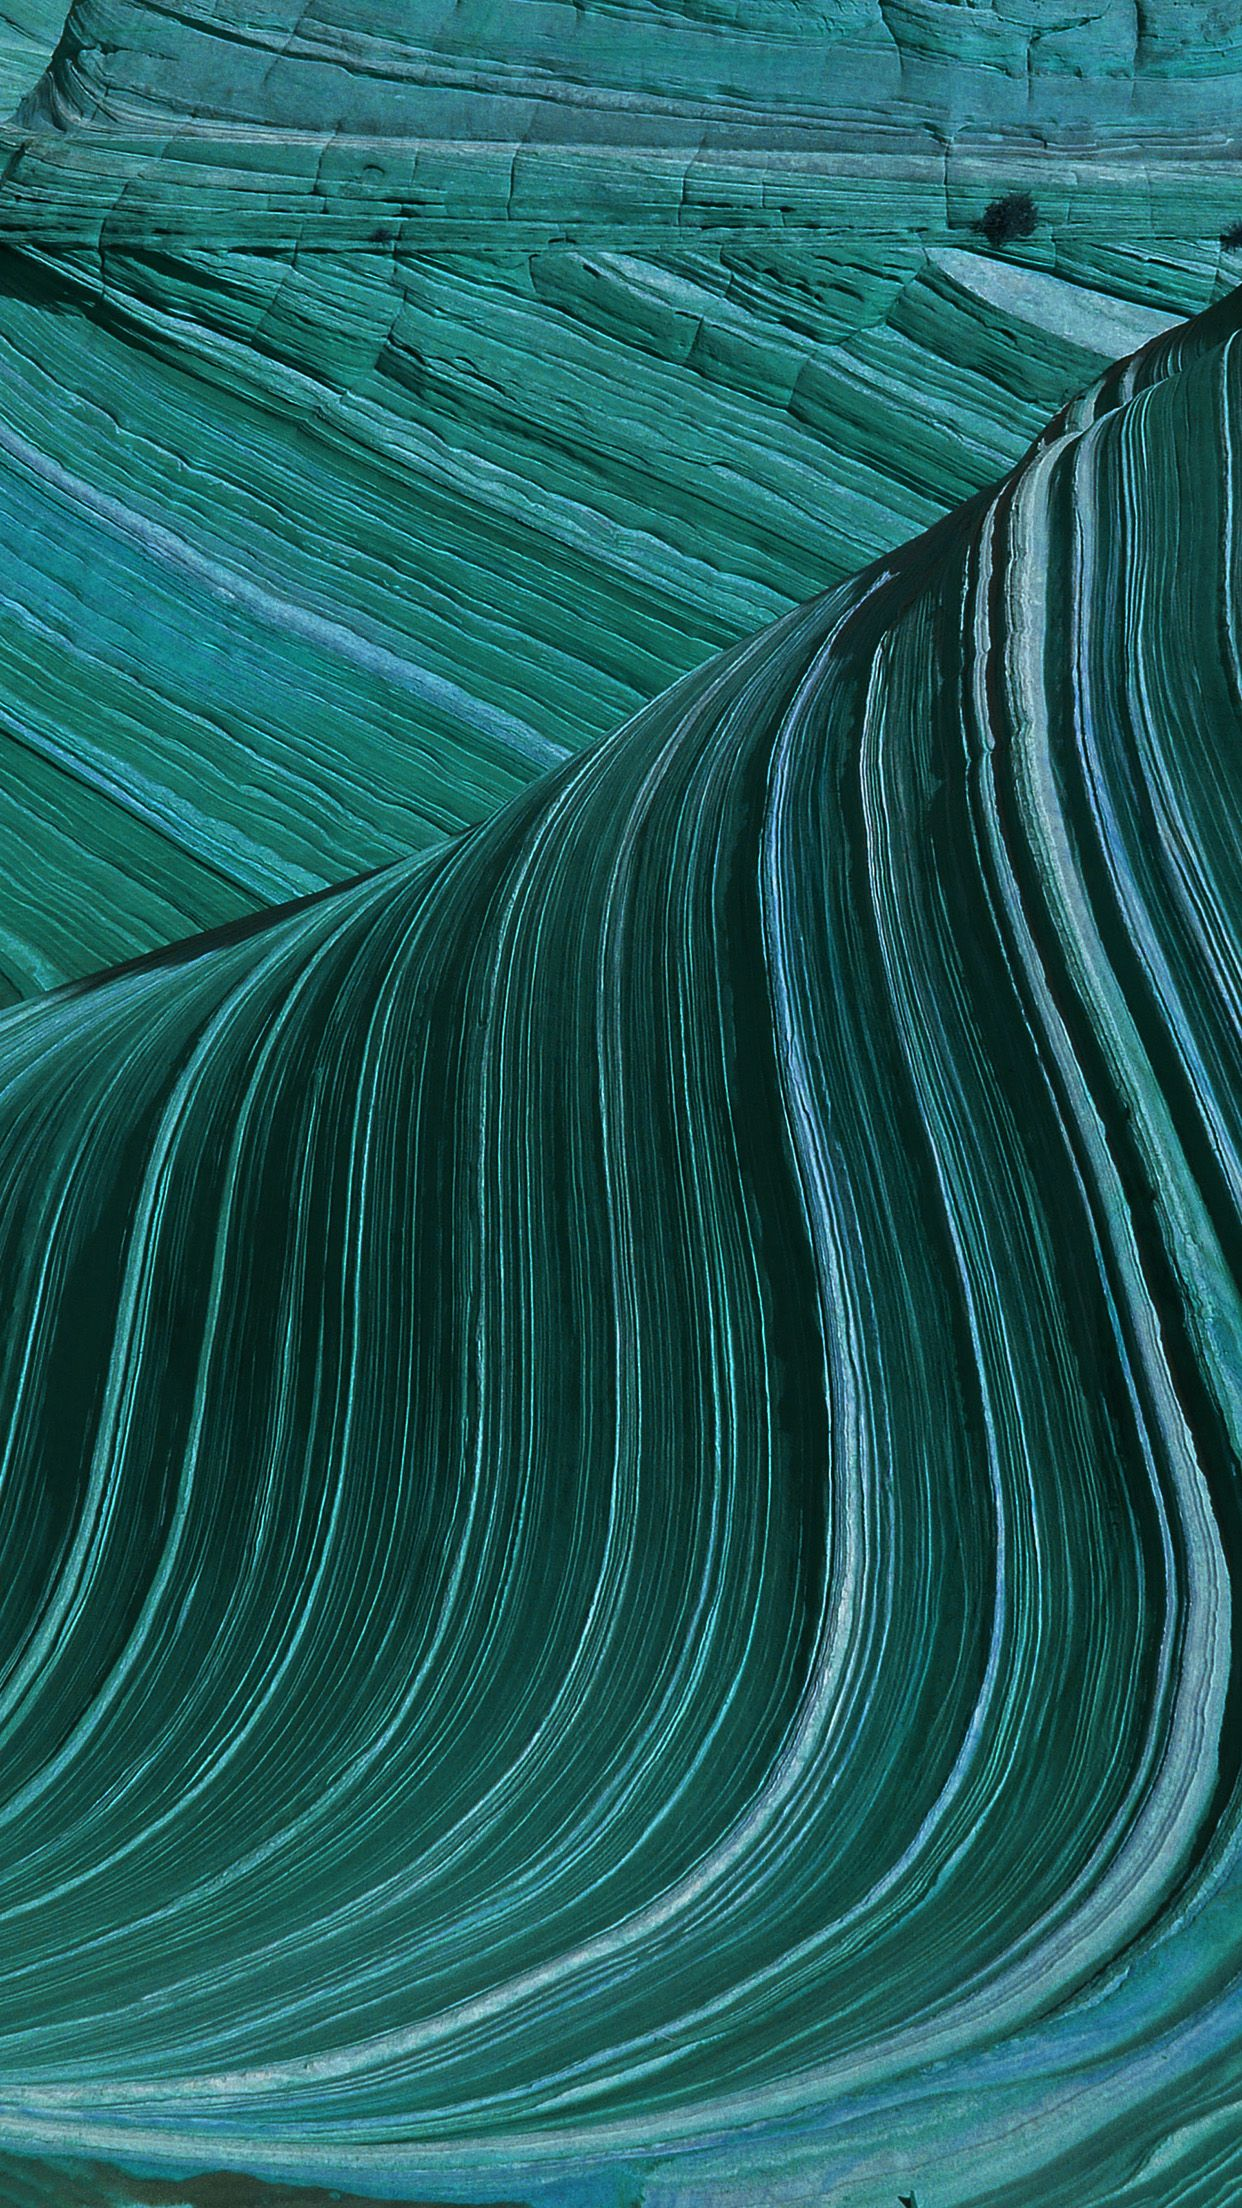 Great Wallpaper Mountain Pattern - 6d366afaf7104e34573f365c8cada2aa  HD_29330.jpg